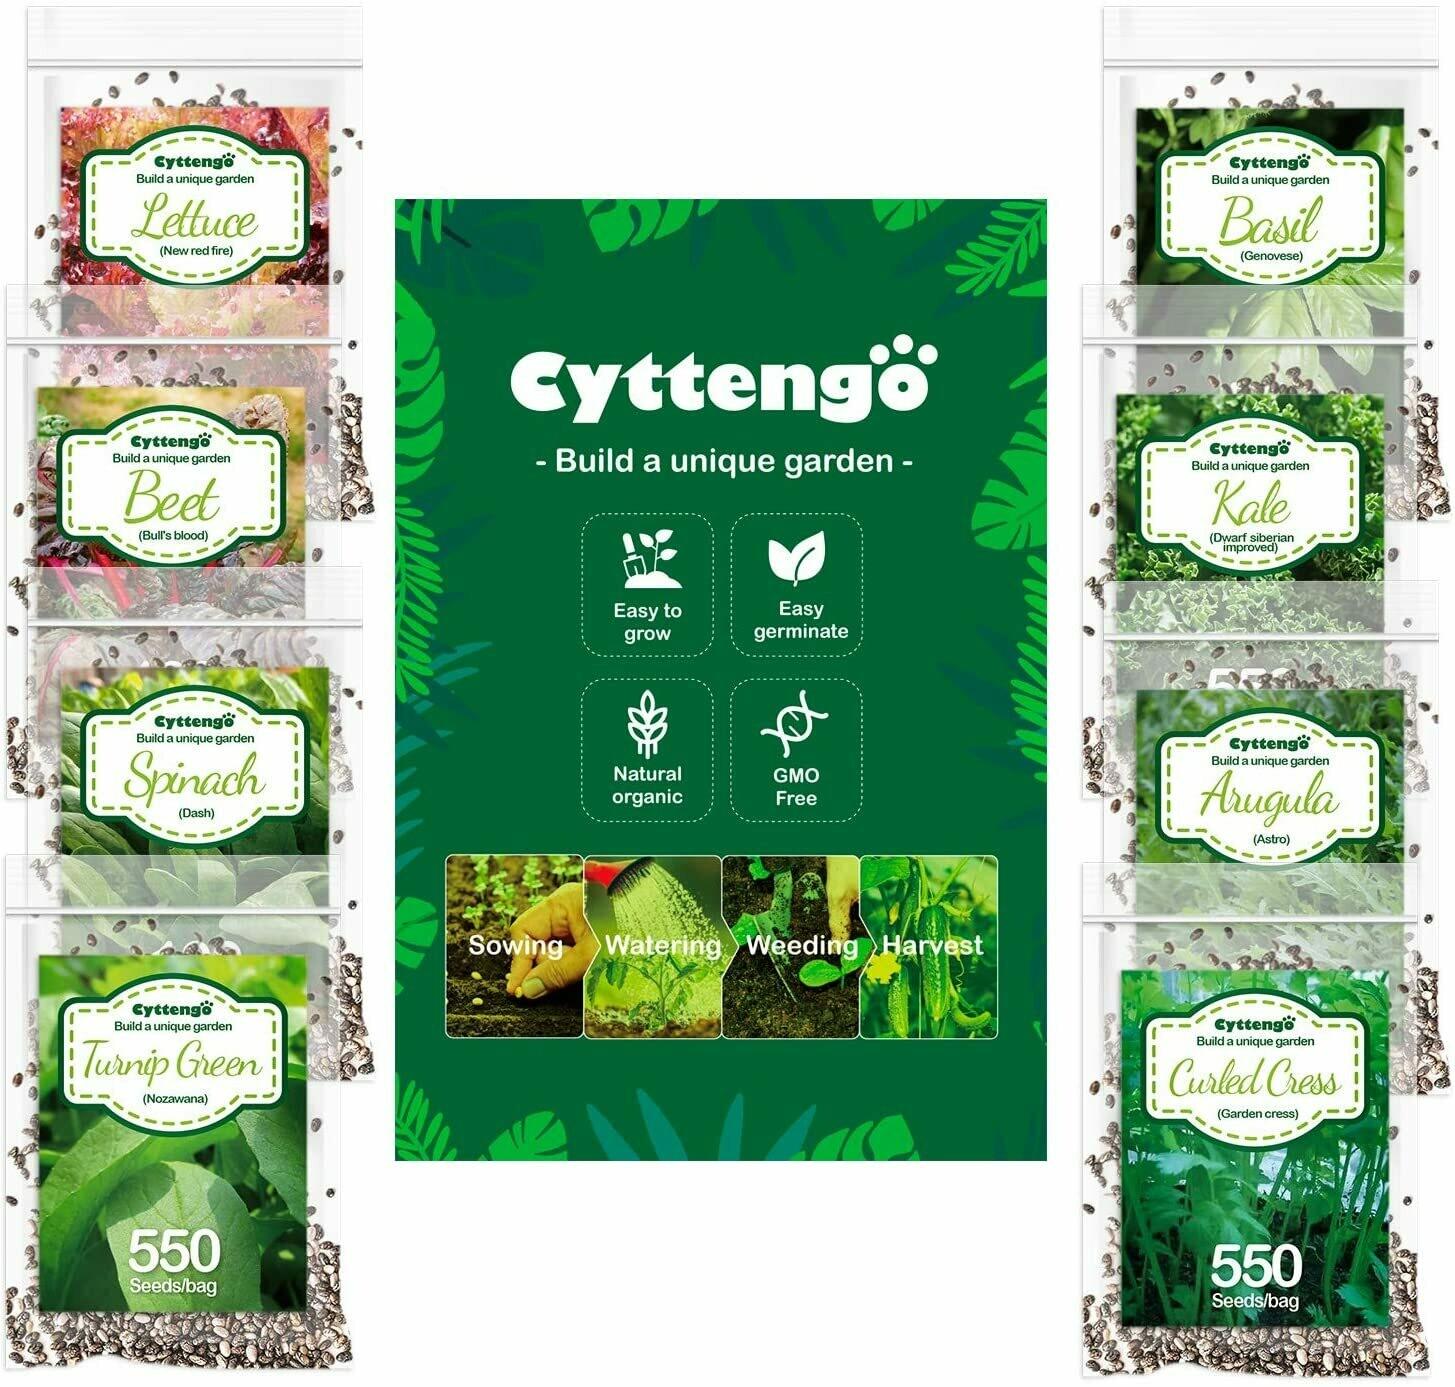 3500 Heirloom Seeds Vegetable Seeds, 8 Varieties Organic Seeds Heirloom Lettuce Seed, 100% Non-GMO Seeds for Planting